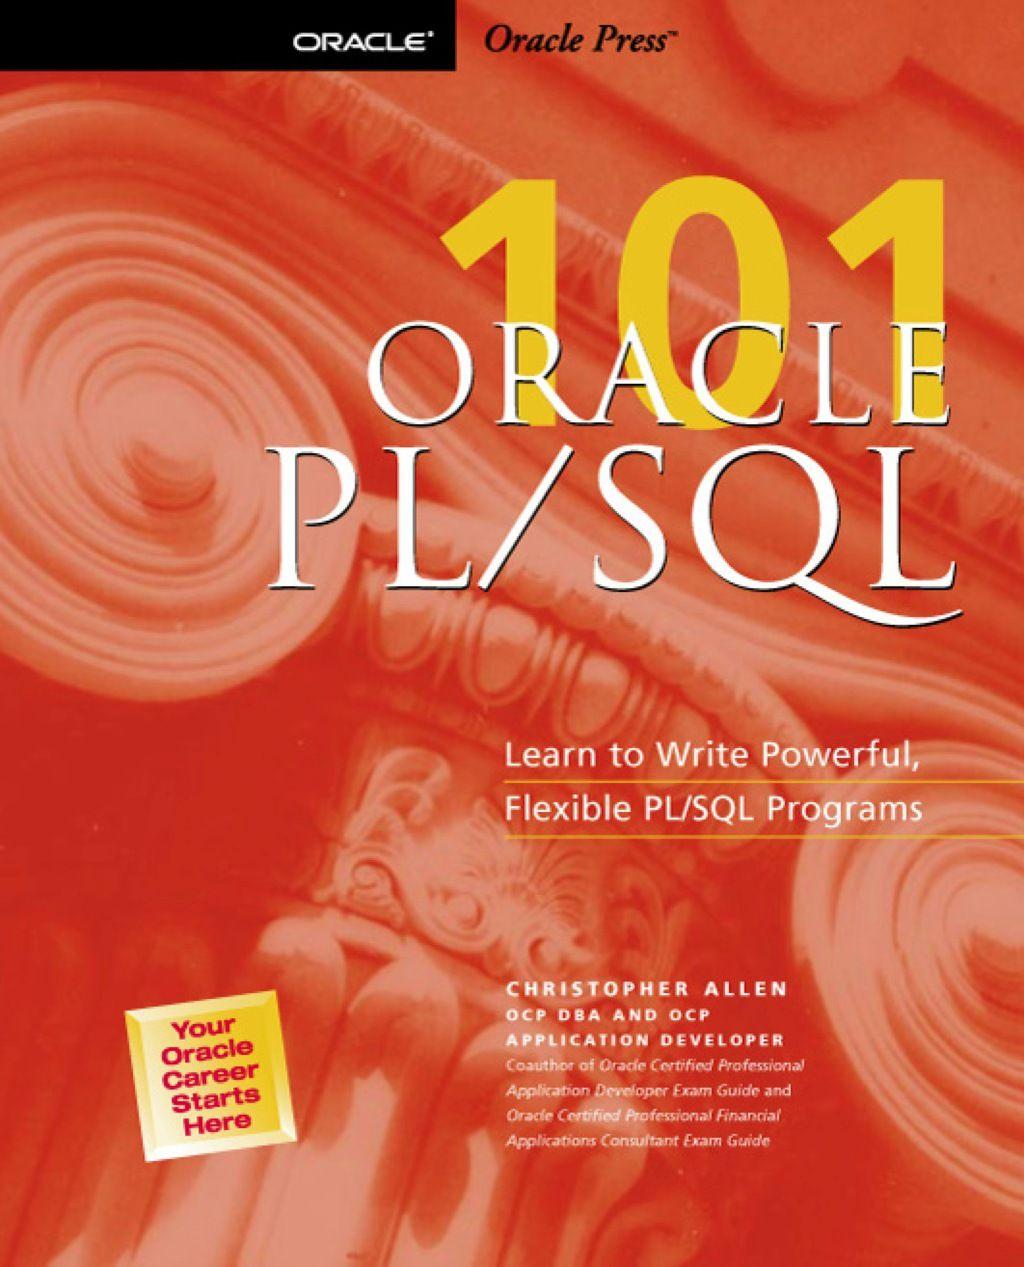 Oracle plsql 101 ebook pl sql sql learning to write